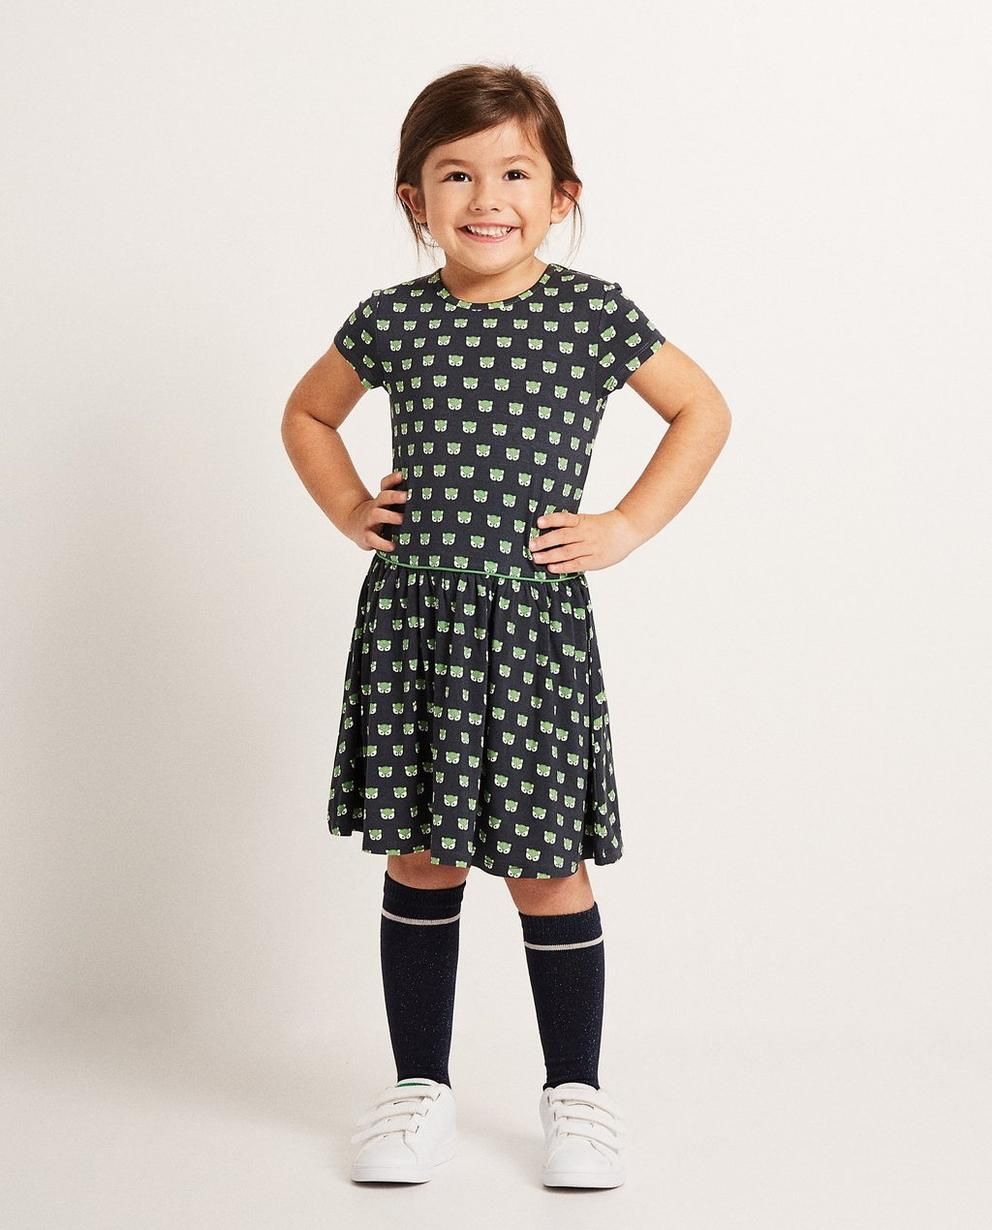 Viskose-Kleid mit Print - A-Linien-Modell - JBC